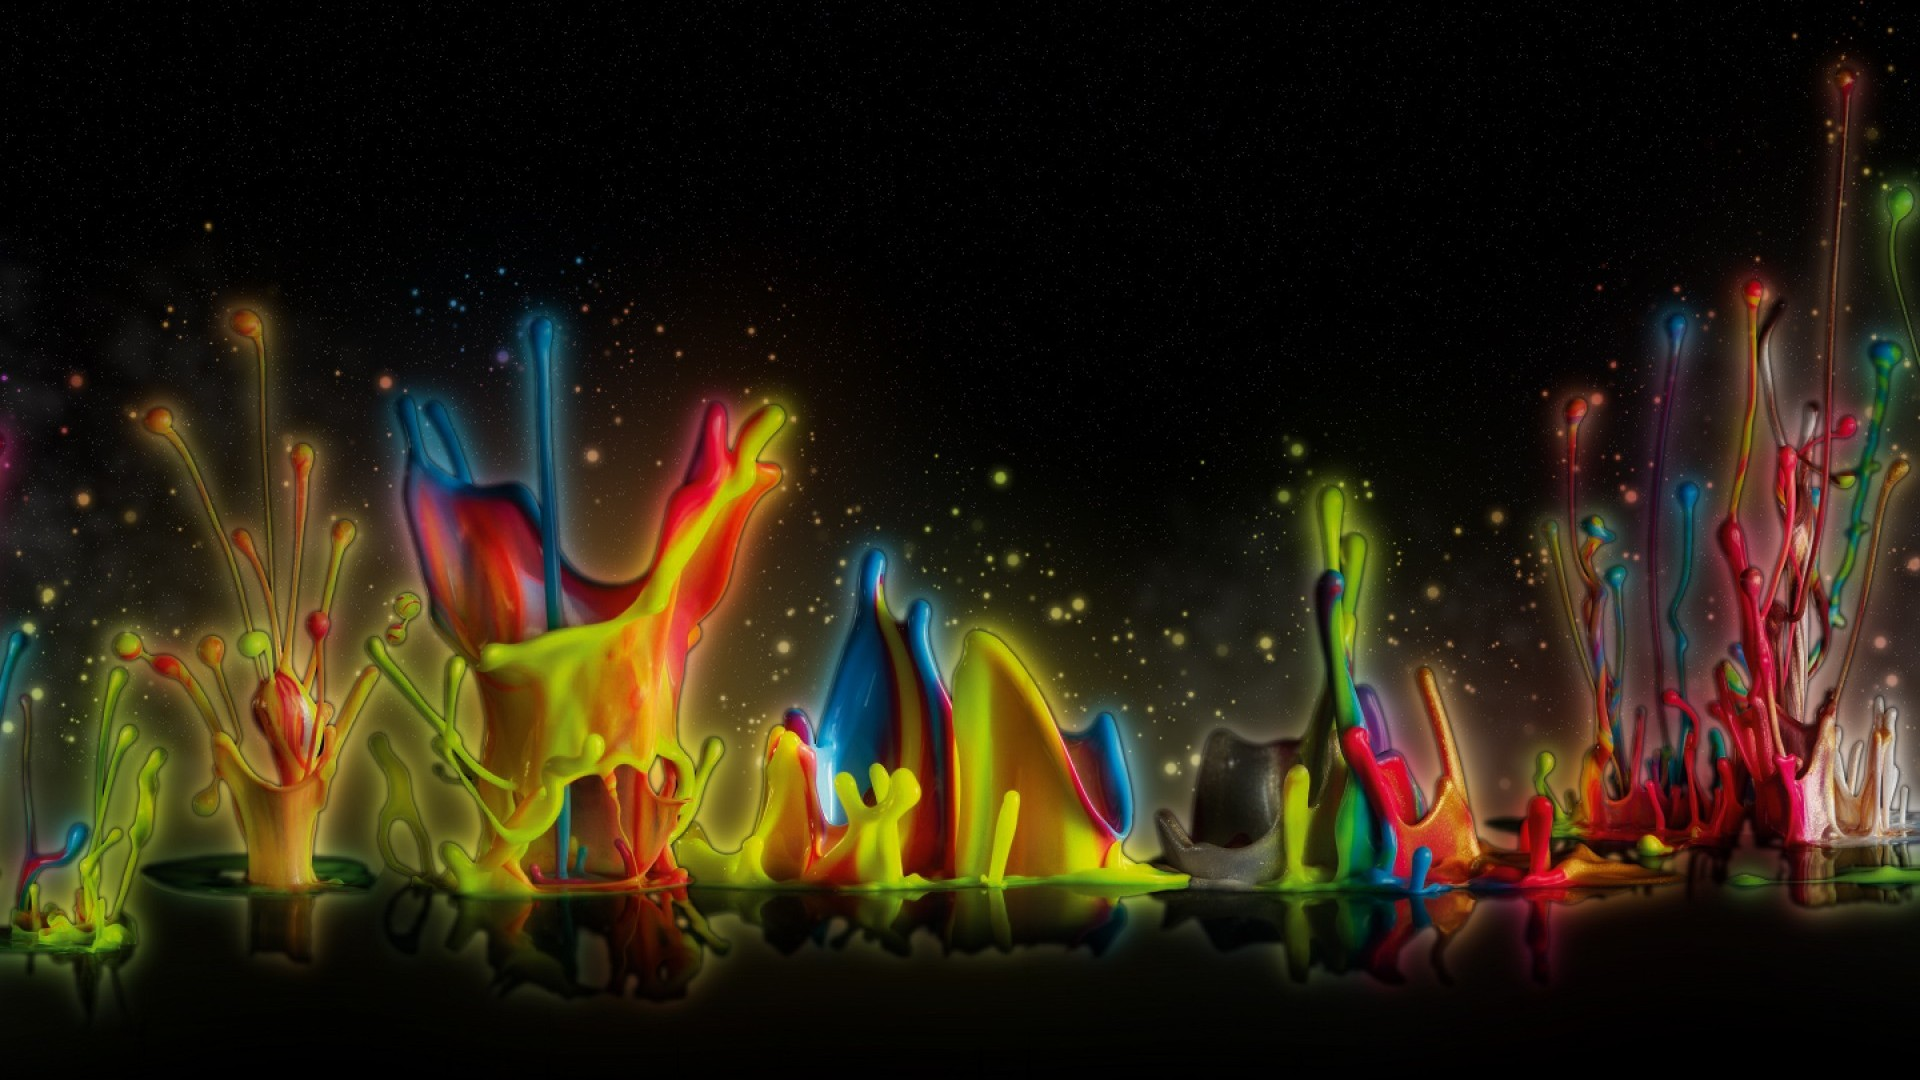 colourful hd 1080p wallpaper - photo #9